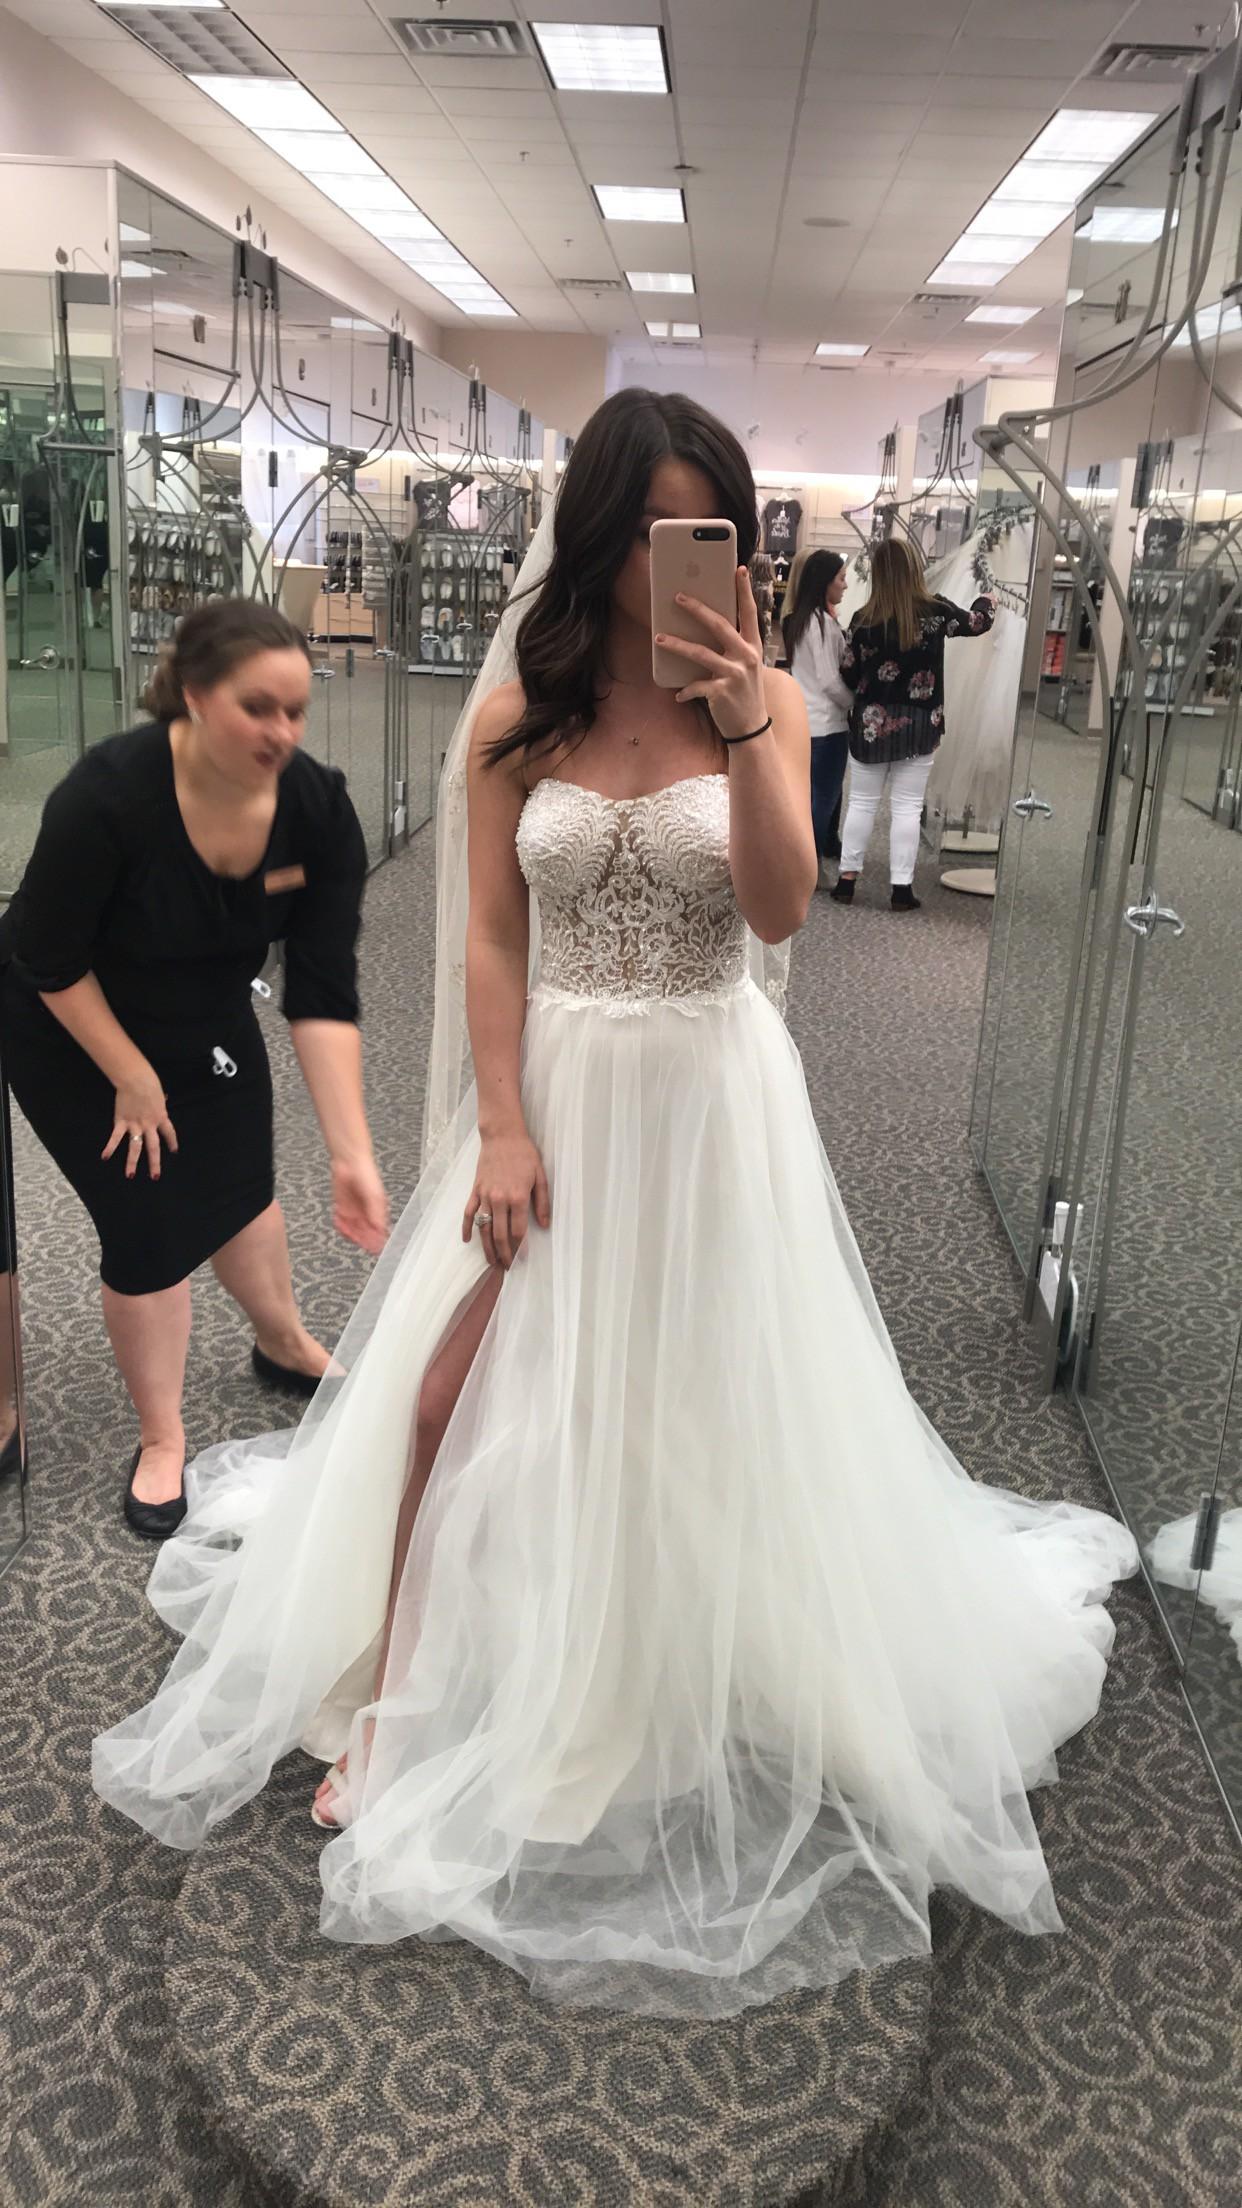 dfc0014839bc Galina Signature Swg764 New Wedding Dress on Sale 19% Off ...